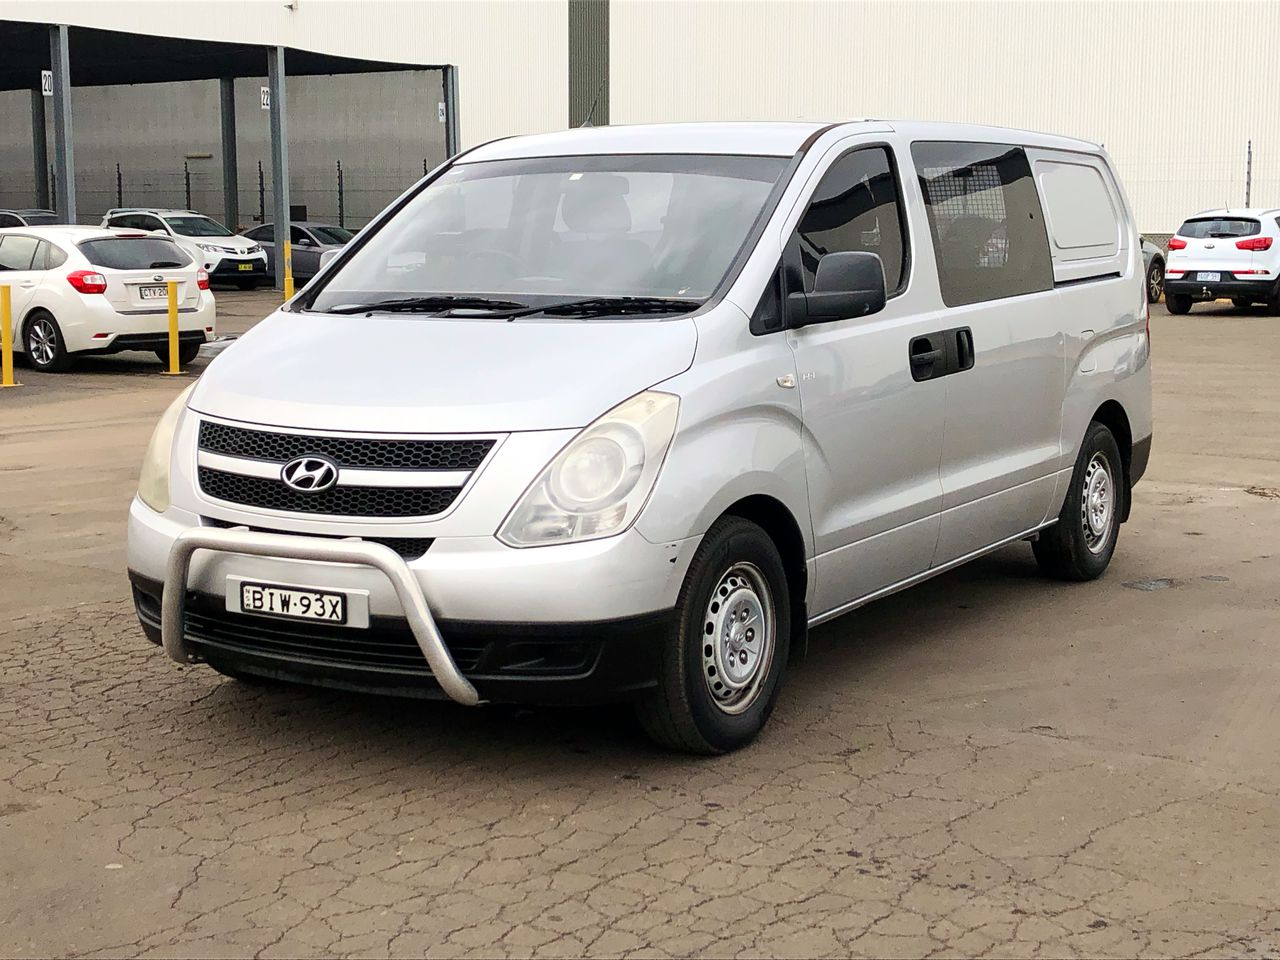 2007 Hyundai iLOAD Crew TQ Turbo Diesel Automatic Van